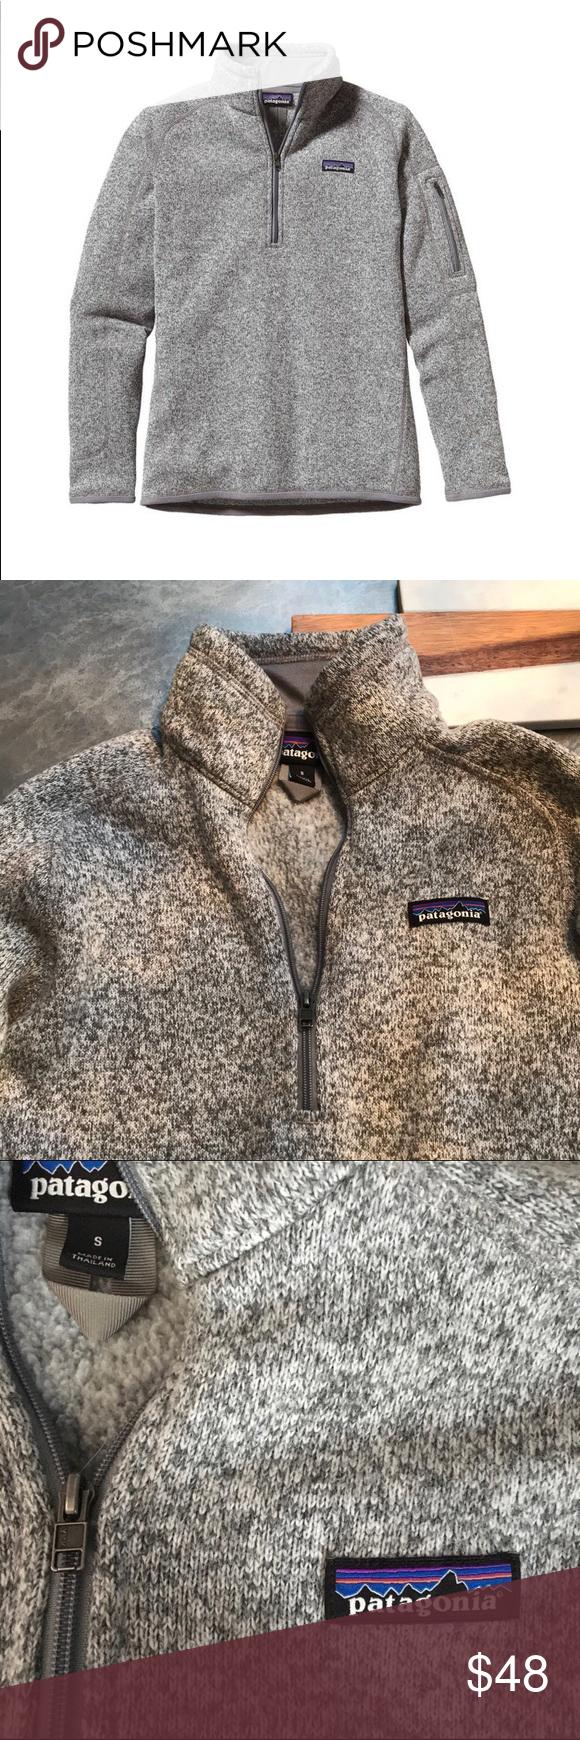 Patagonia half zip Gray, size small, good condition Patagonia Jackets & Coats